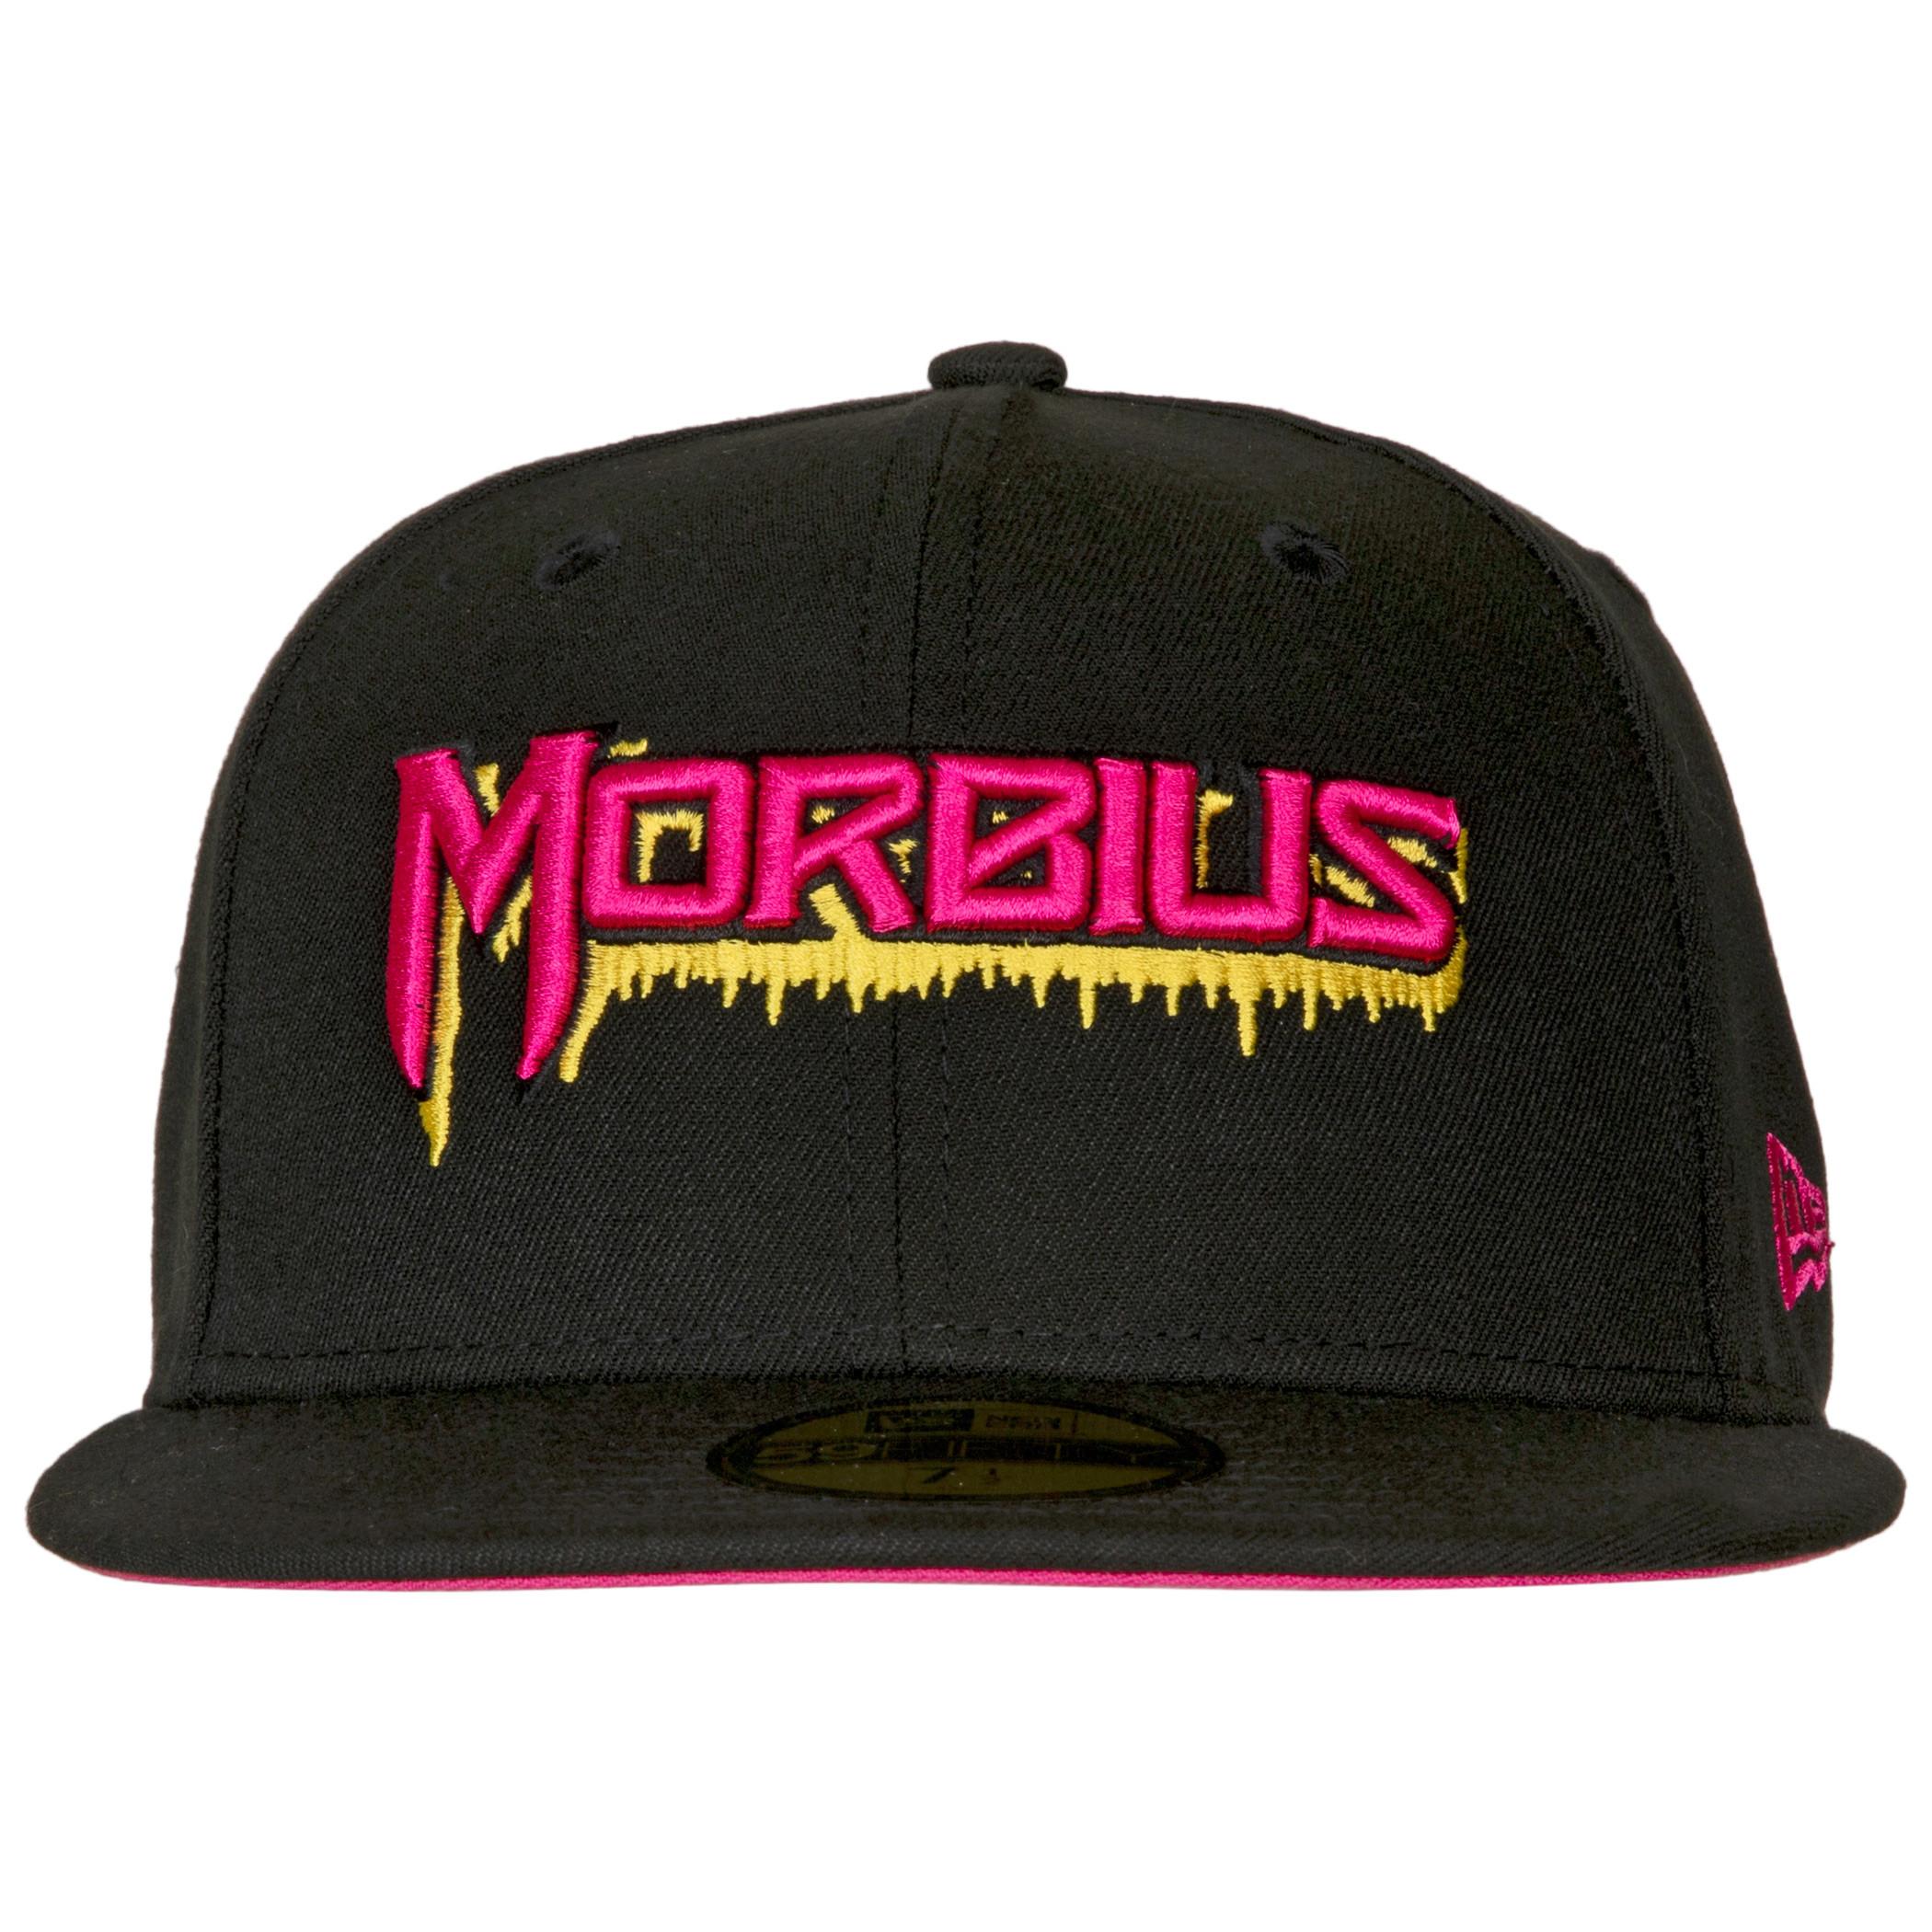 Morbius The Living Vampire Bleeding Logo New Era 59Fifty Fitted Hat